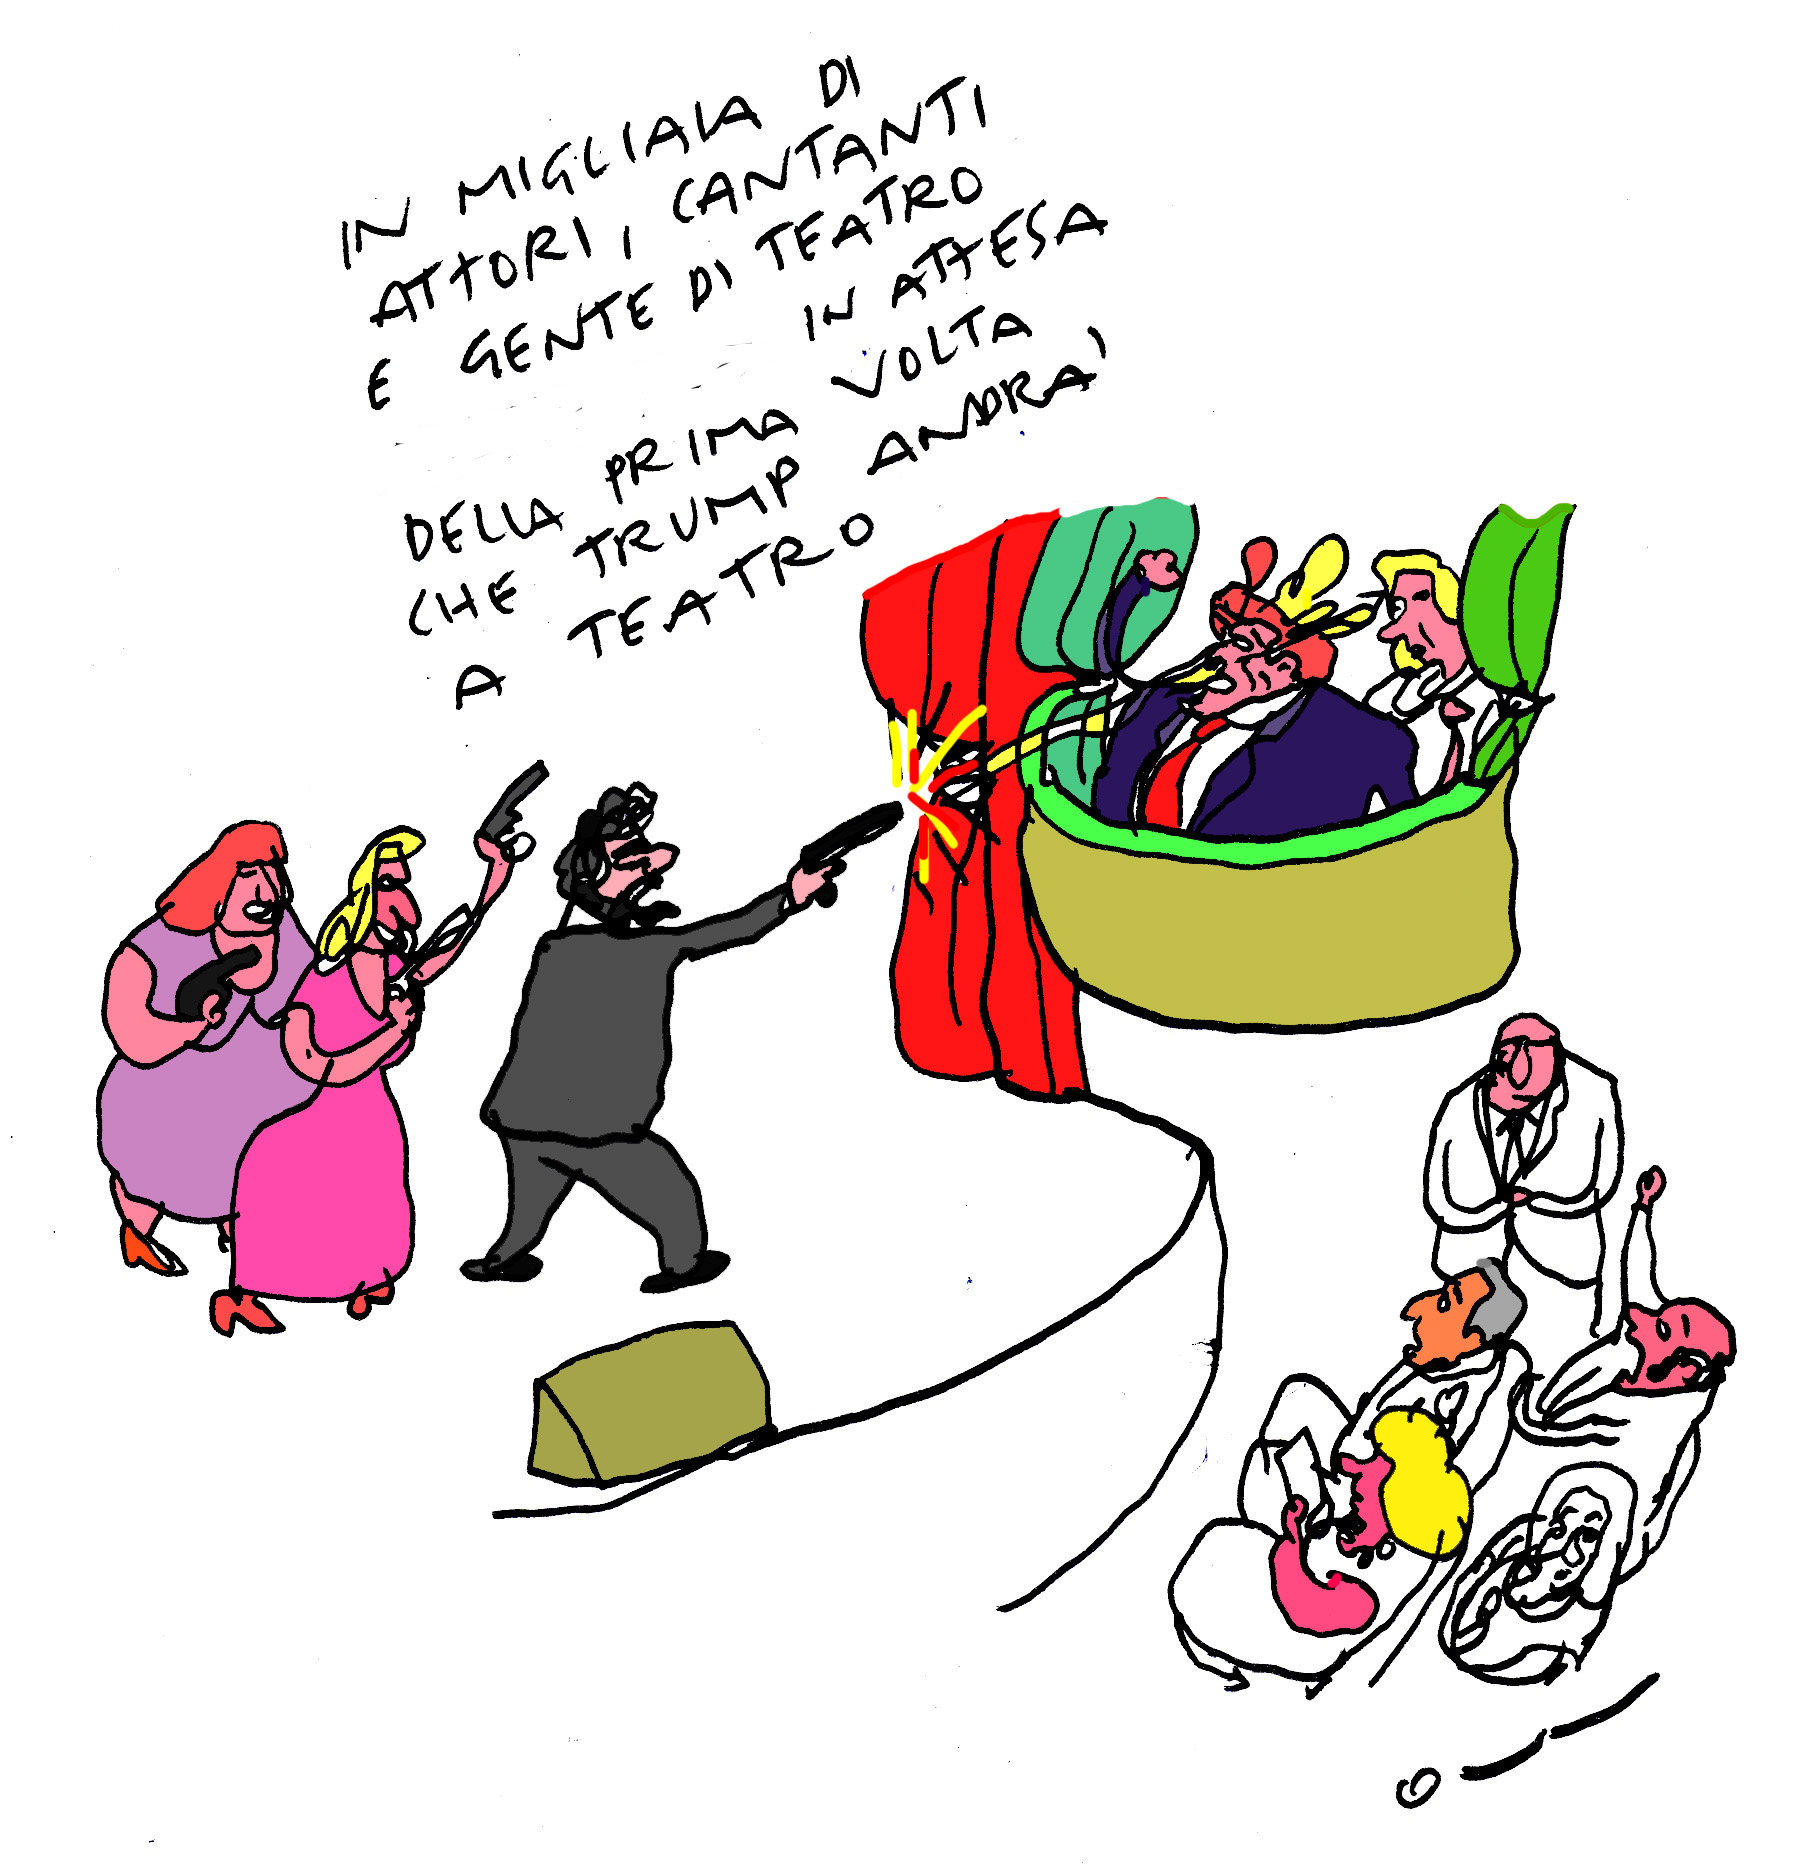 genkkkte-teatro